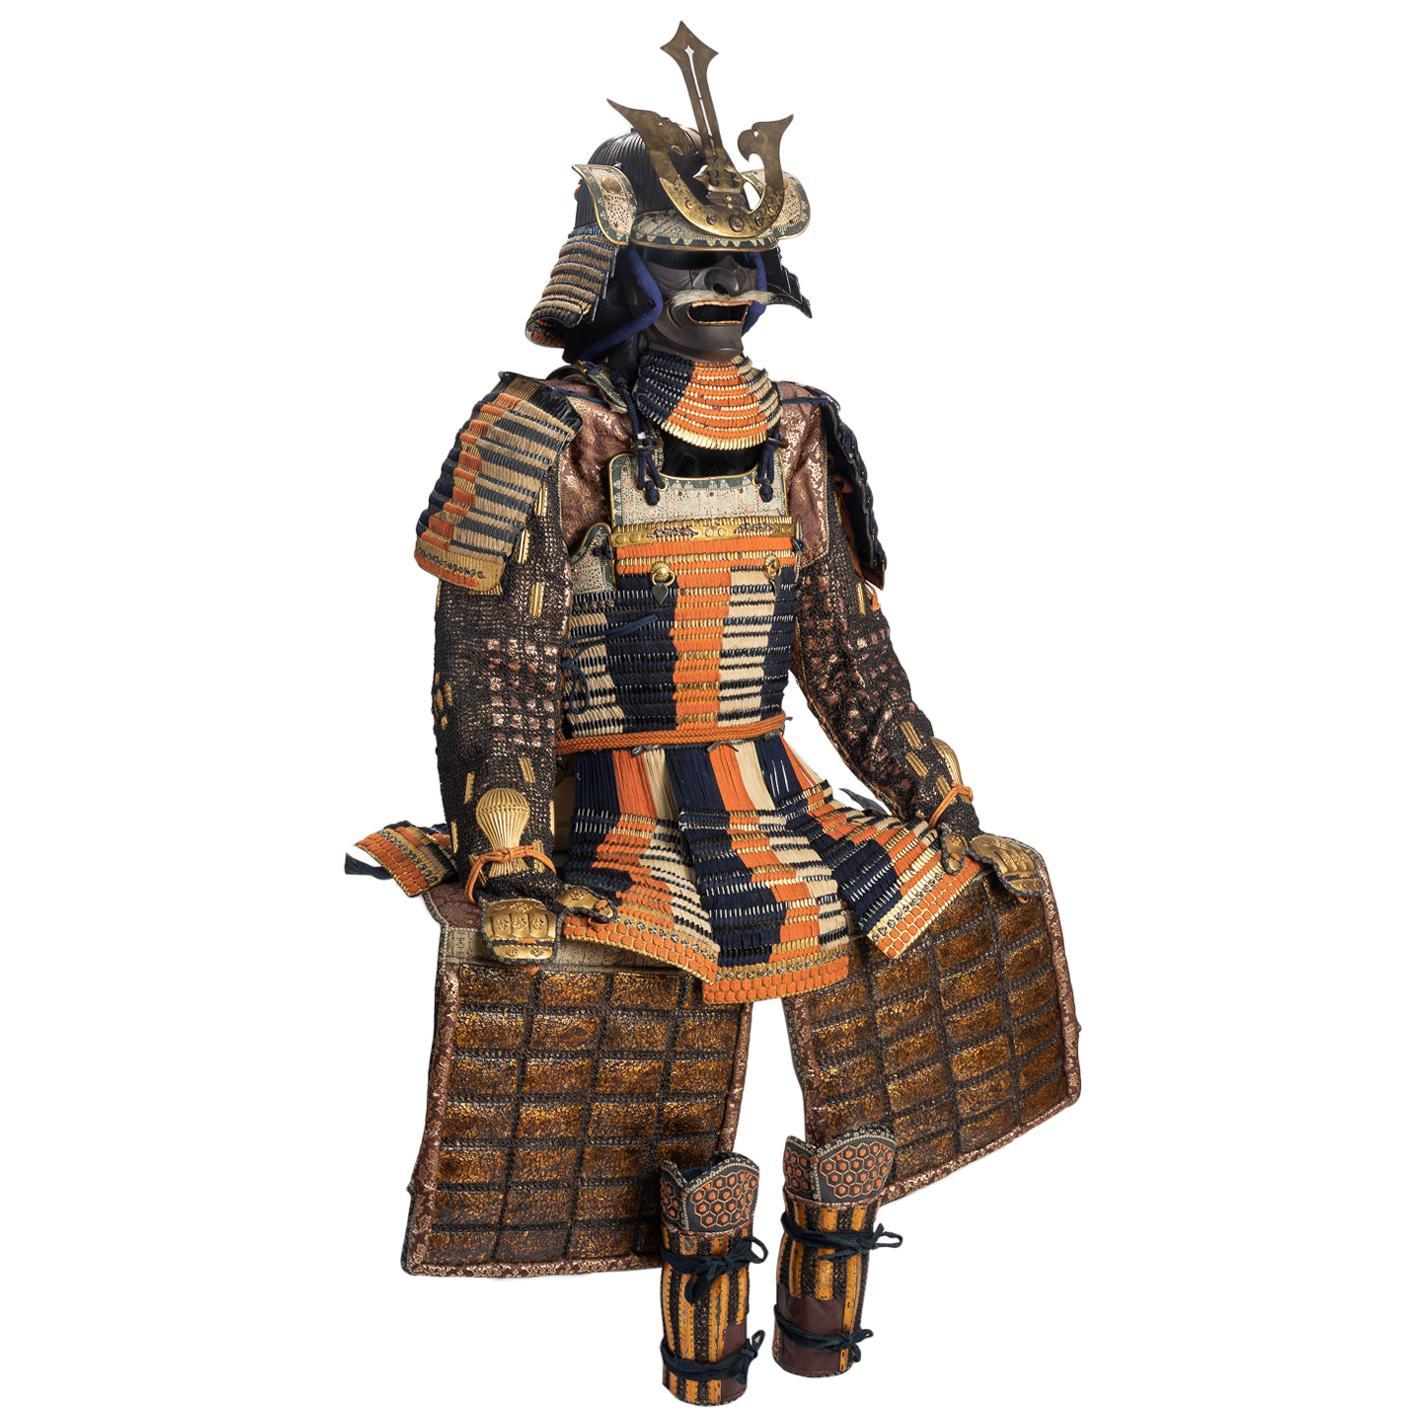 Dō Maru Tosei Gusoku, Japanese Armor of Do-Maru Type, Early Edo Period, 17th-18t